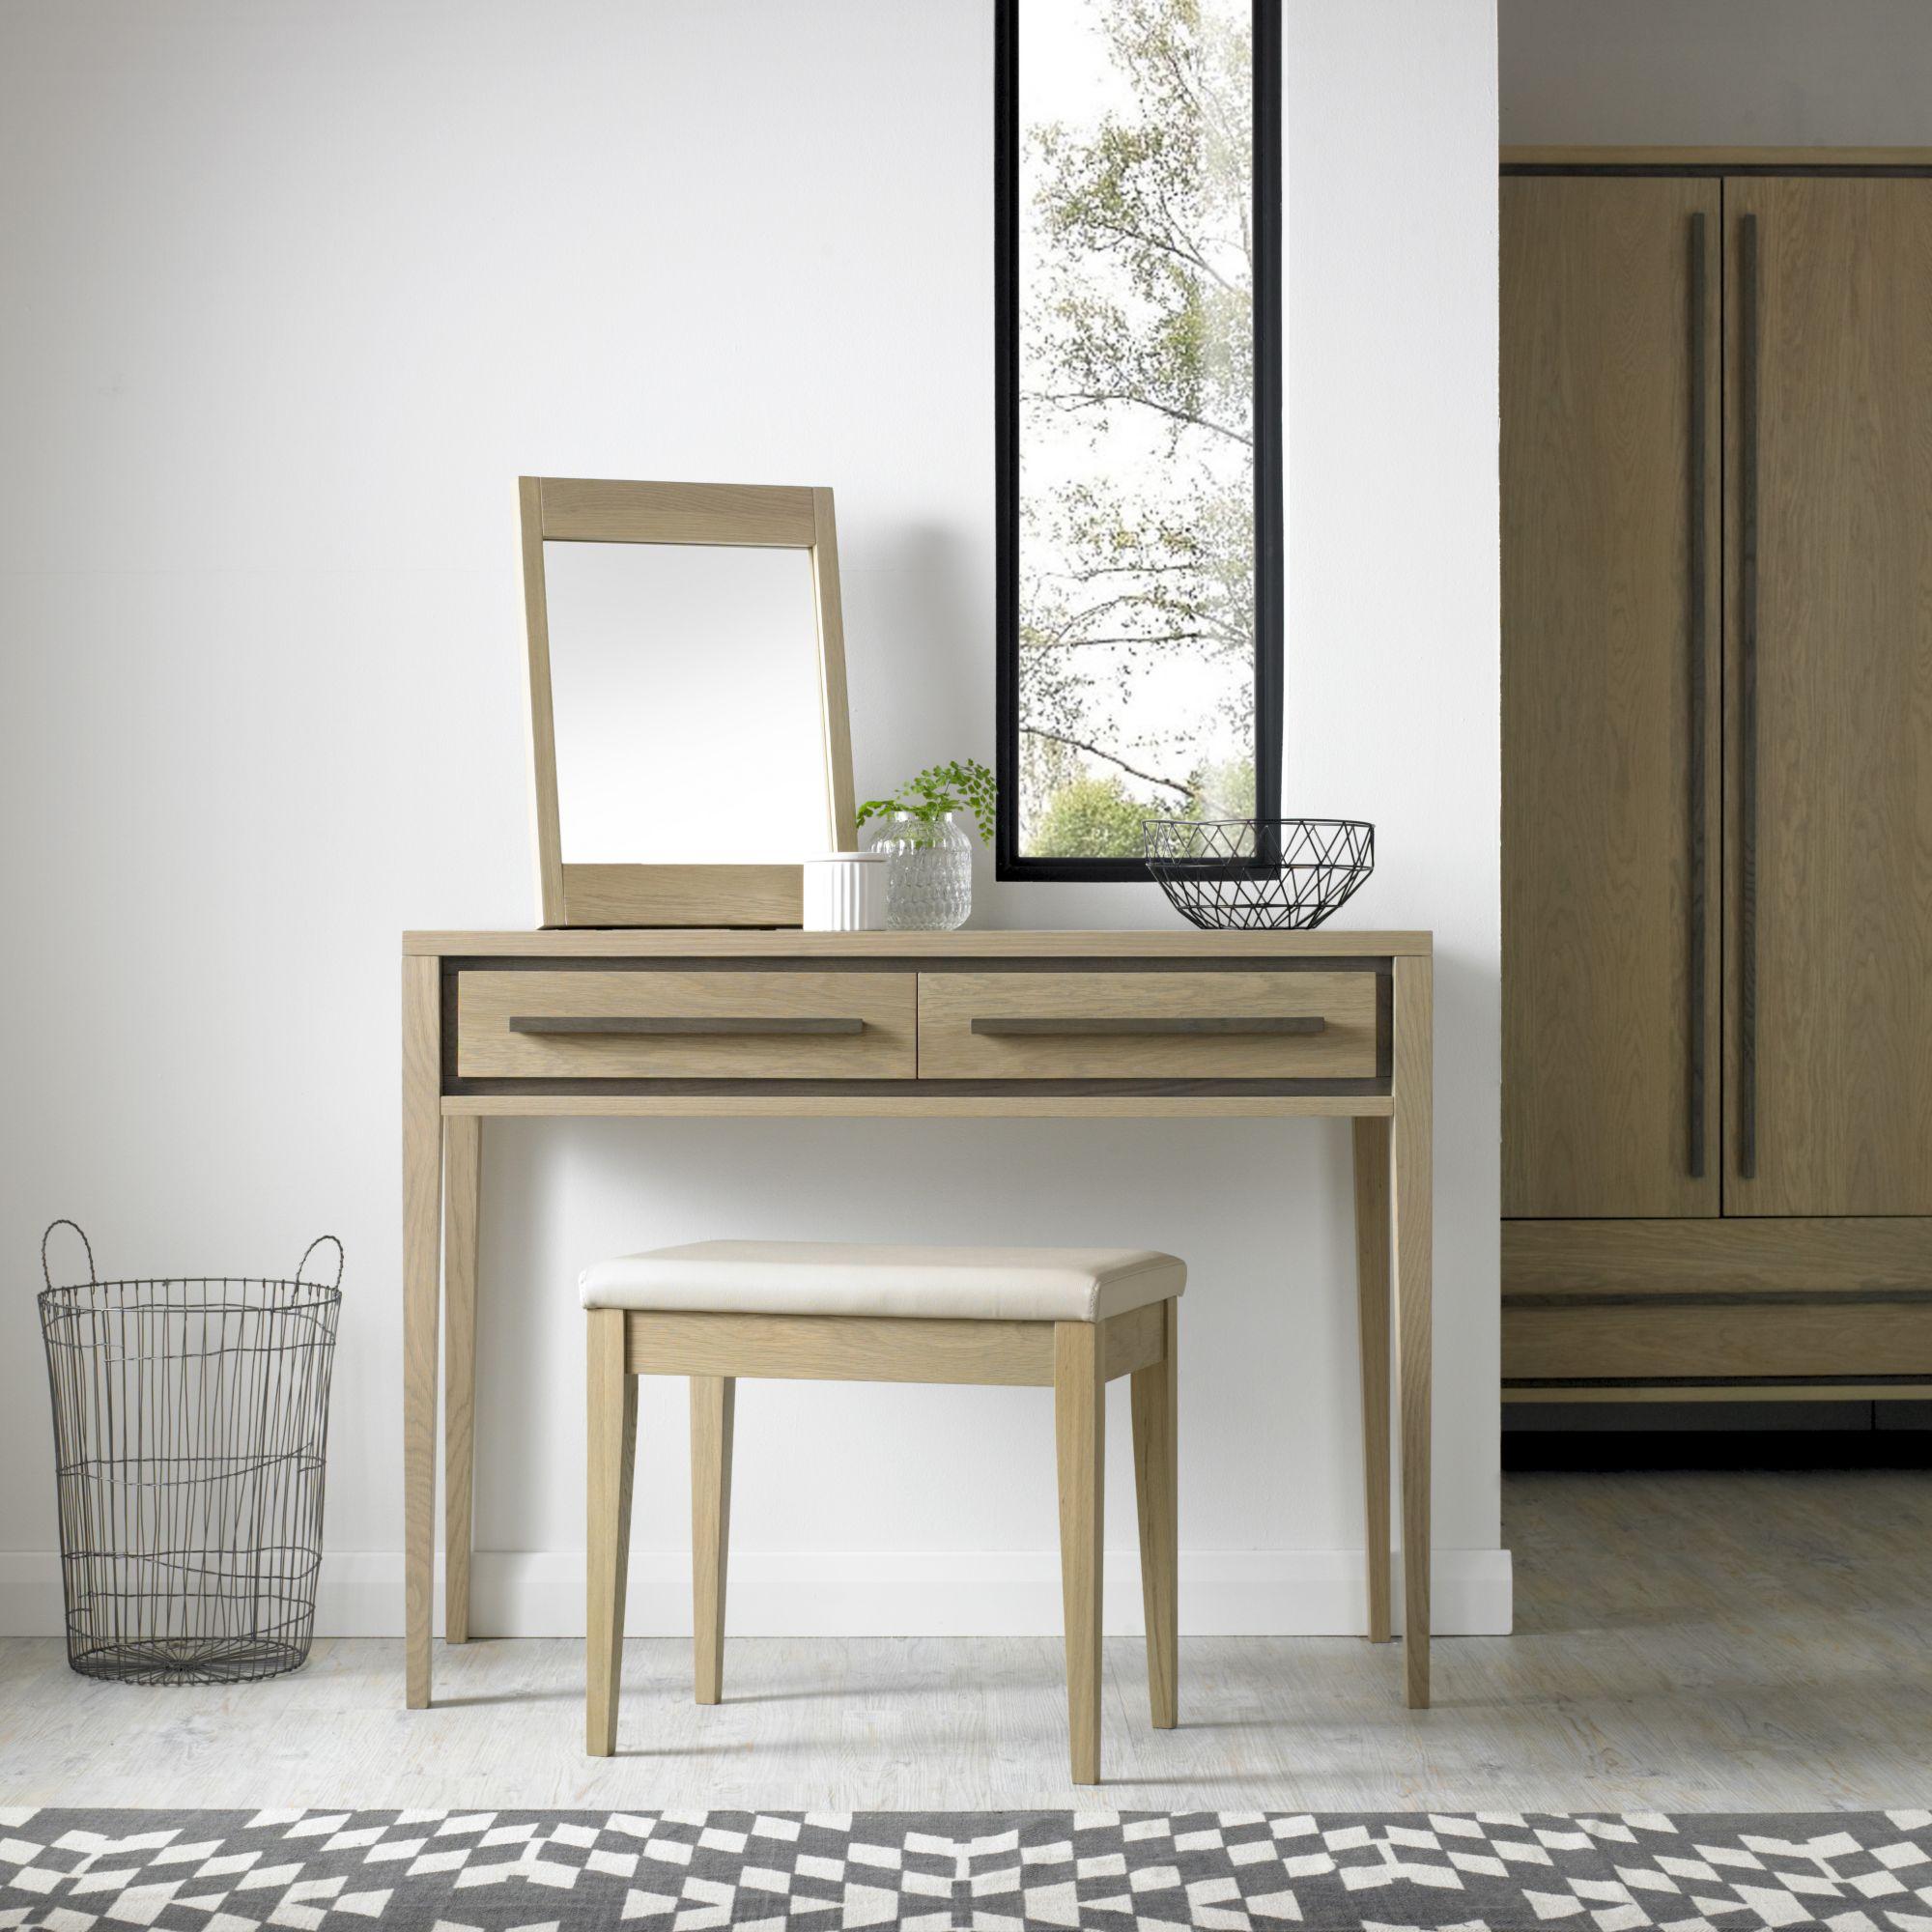 CARELL DRESSING TABLE - L107cm x D45cm x H81cm